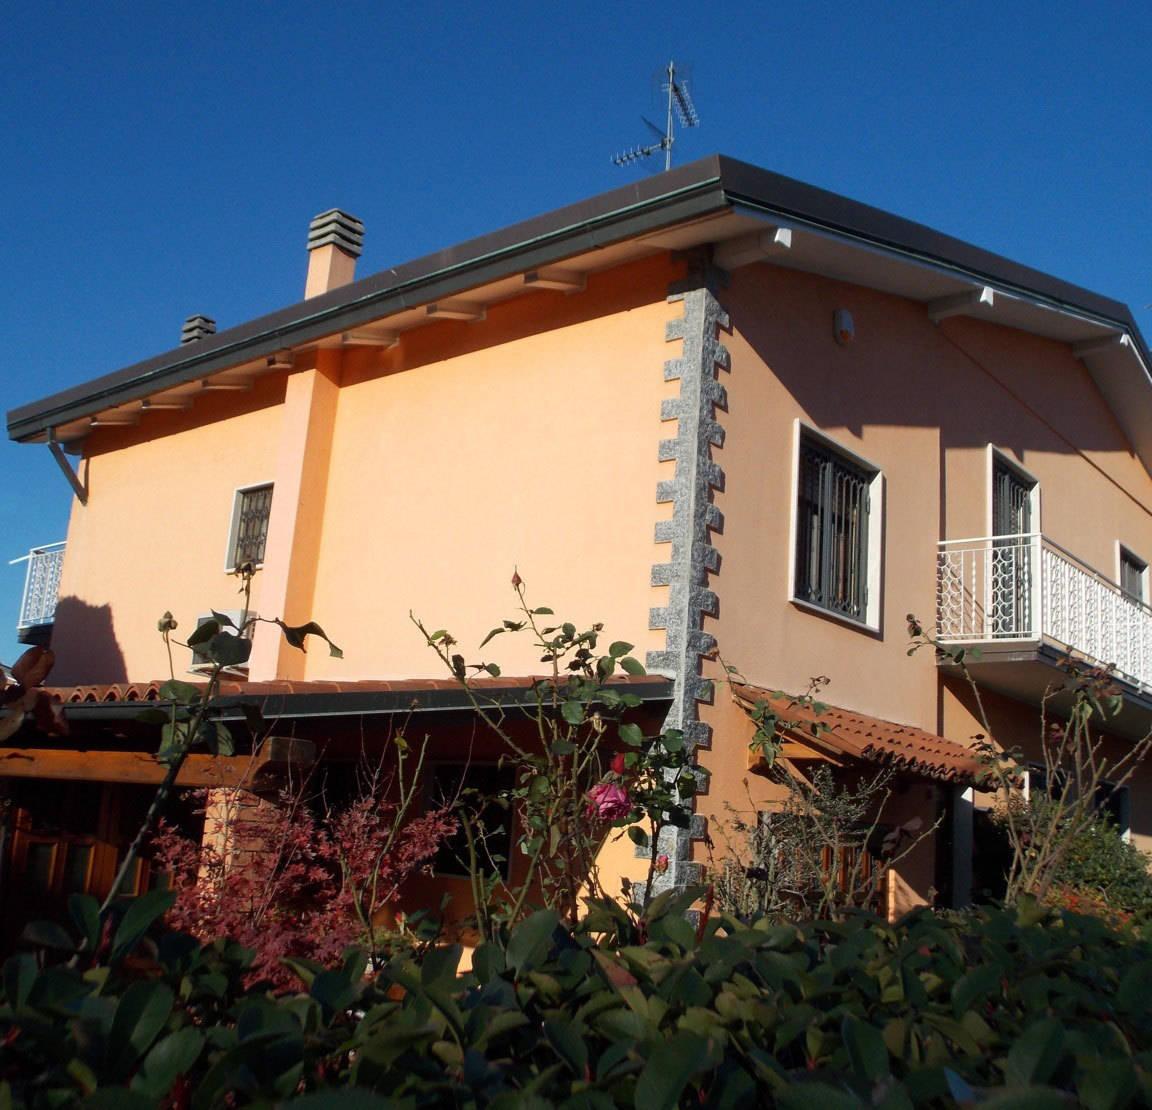 Villa-a-San-Giuliano-Milanese-in-Sesto-Ulteriano-8